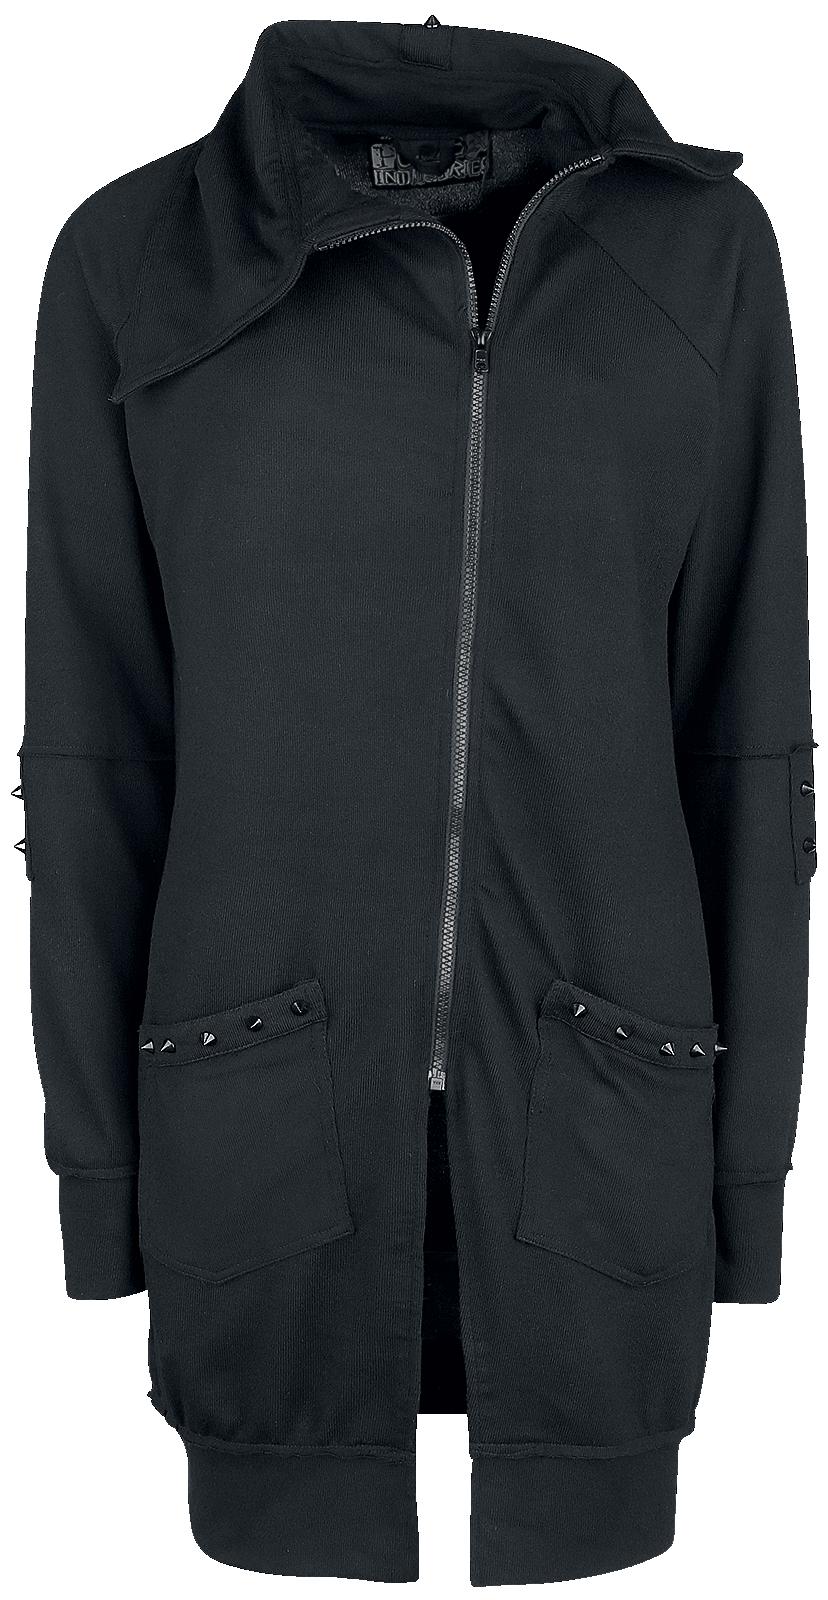 Poizen Industries - Diem Cardigan - Girls' cardigan - black image